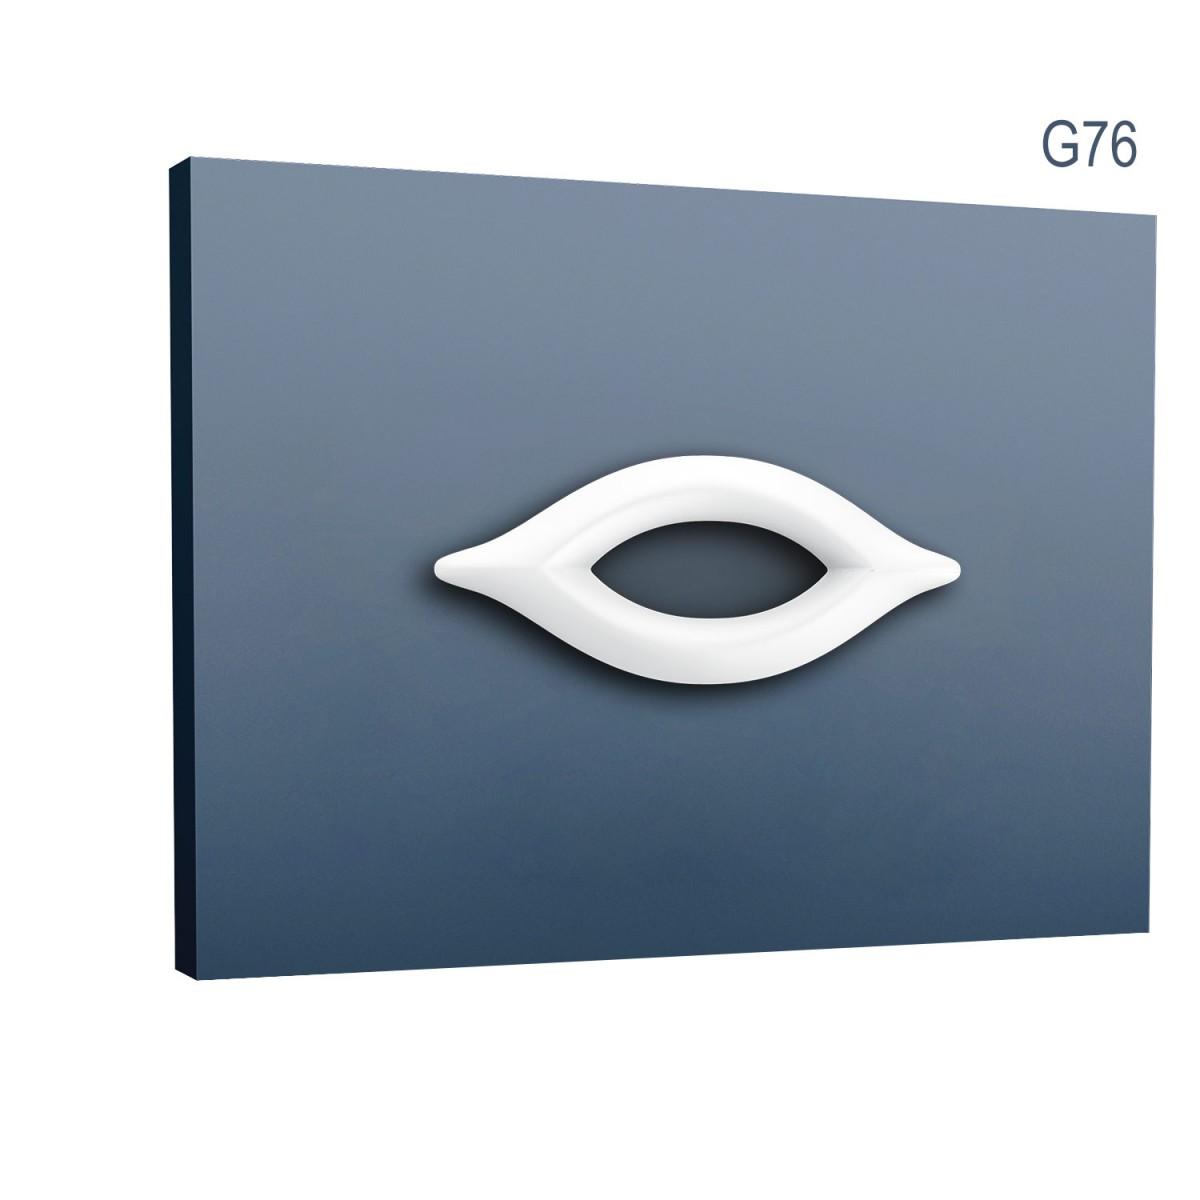 Element Decorativ Ulf Moritz G76, Dimensiuni: 8 X 17.8 X 1.5 cm, Orac Decor